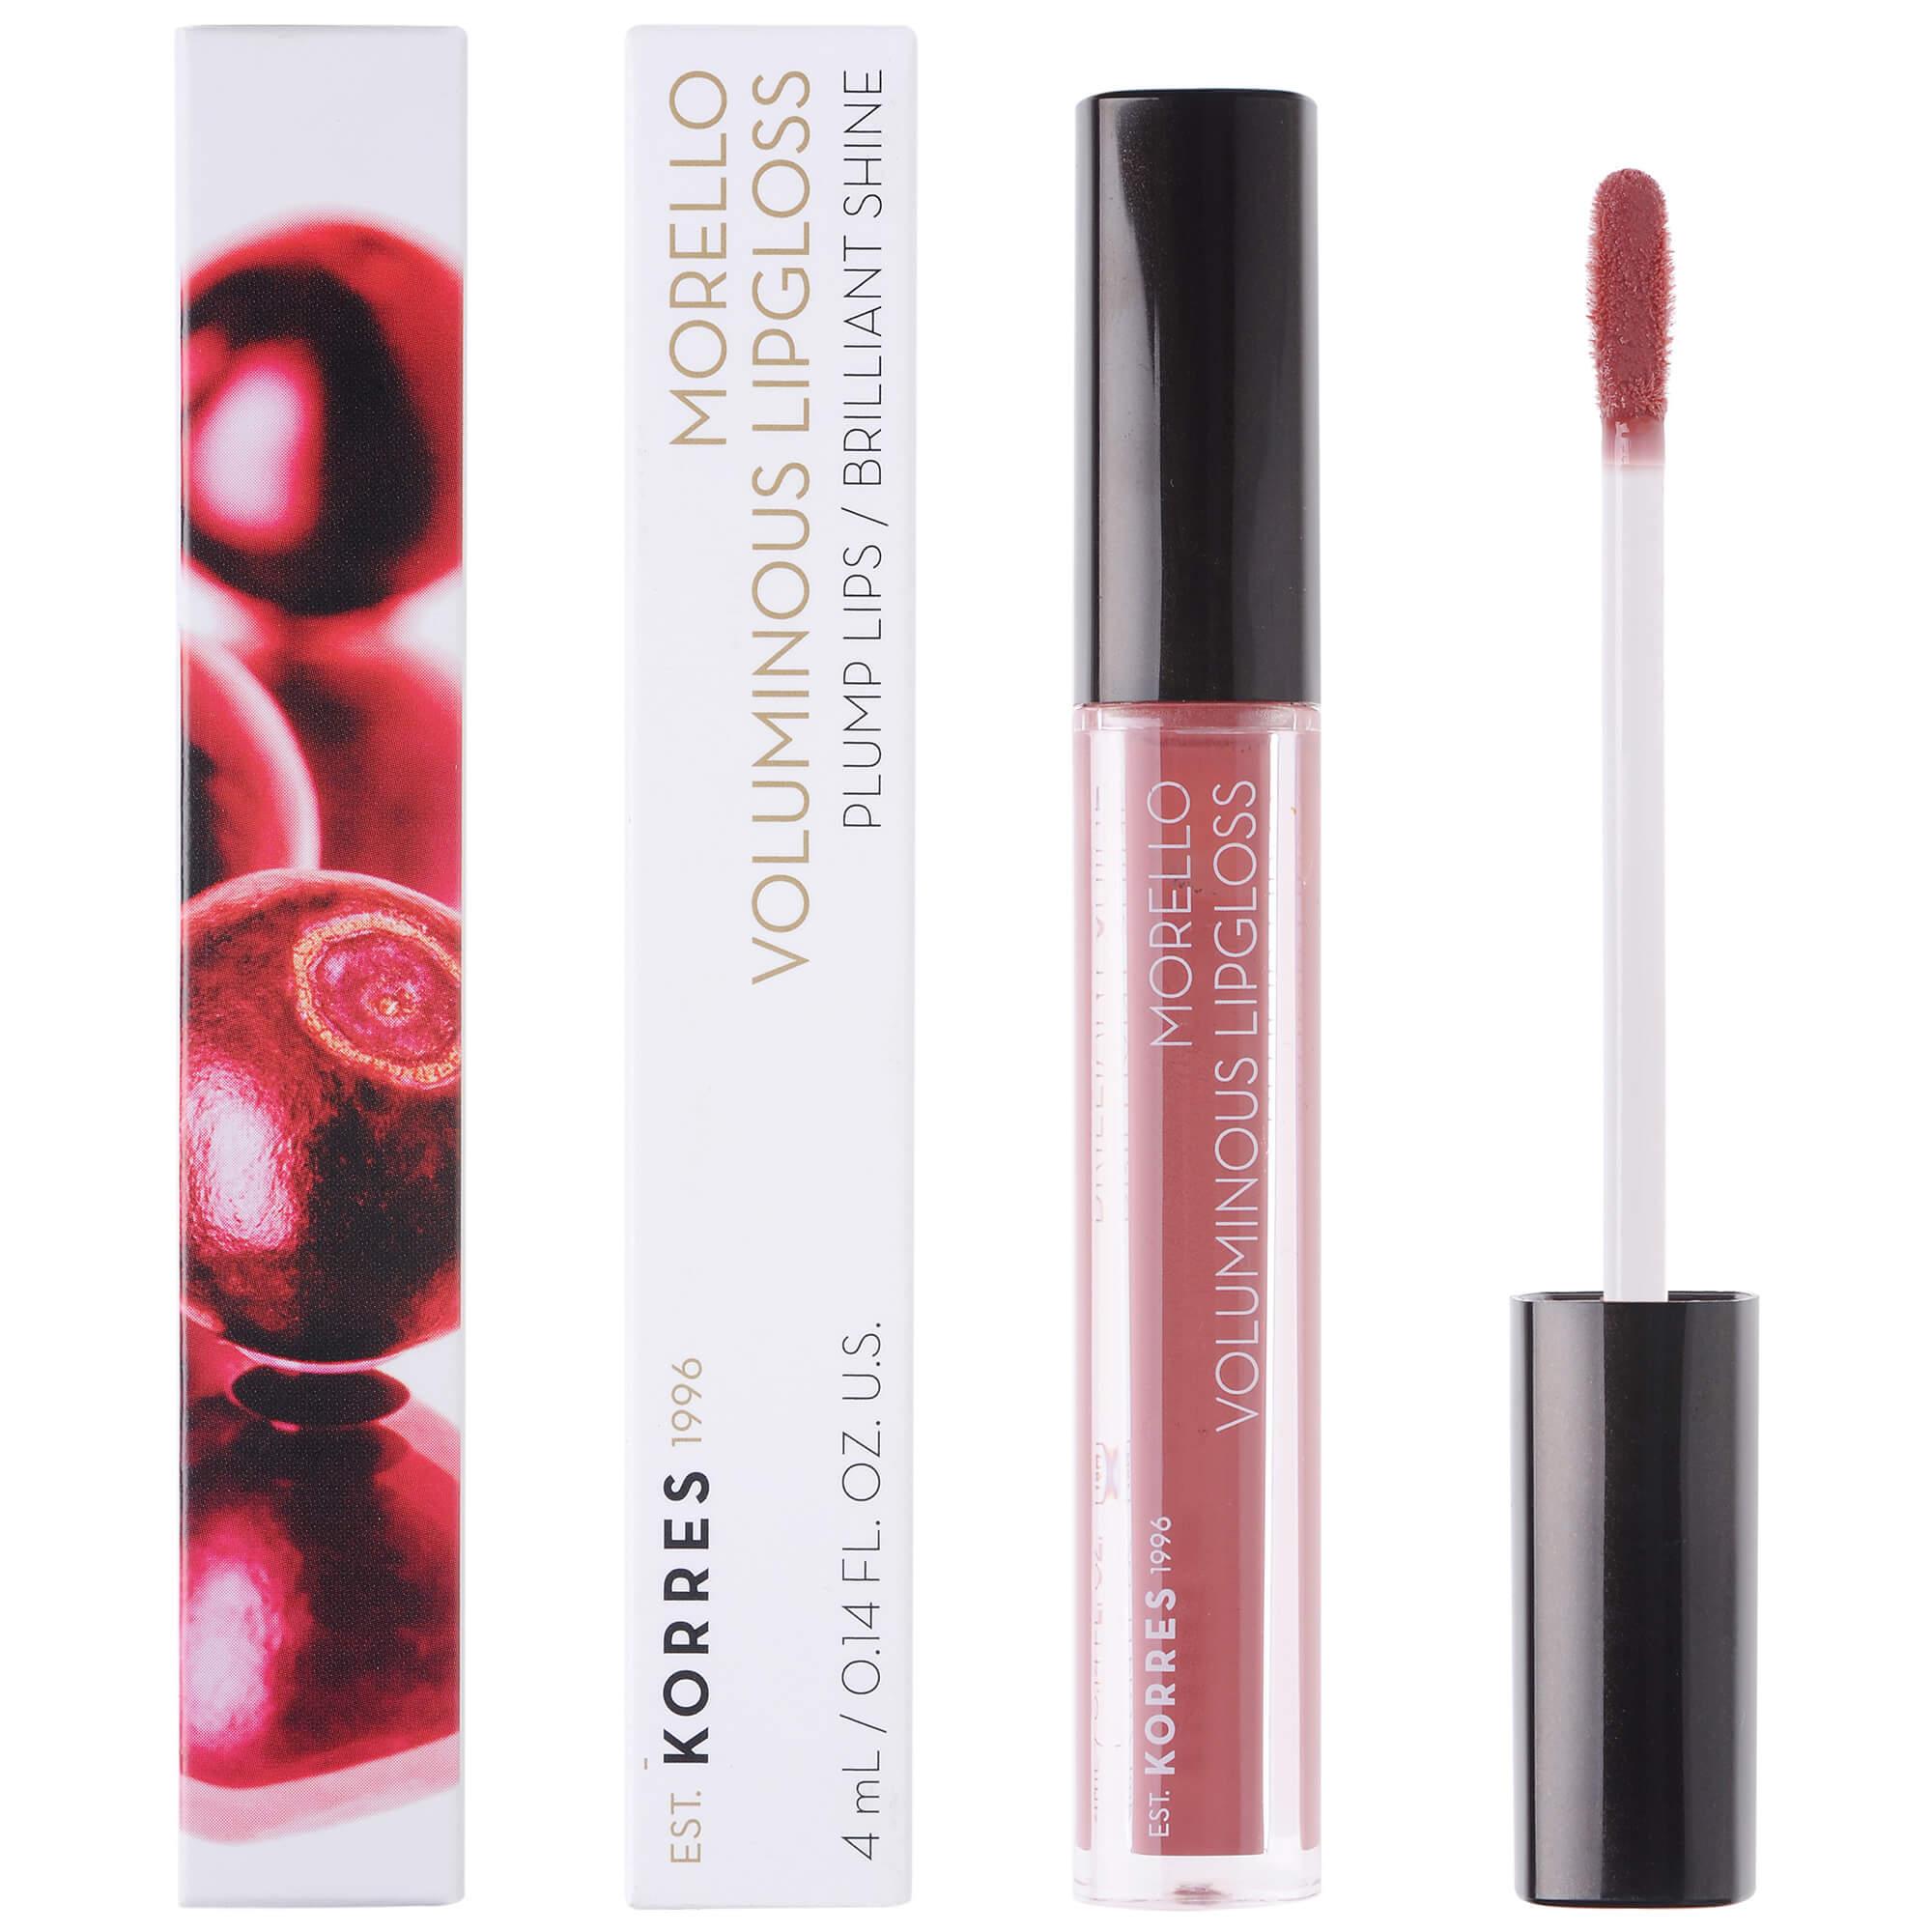 Korres Morello Voluminous Lipgloss Brilliant Shine Ενυδατικό Lipgloss με Εξαιρετική Λάμψη & Γεμάτο Χρώμα που Διαρκεί 4ml – 23 Natural Purple